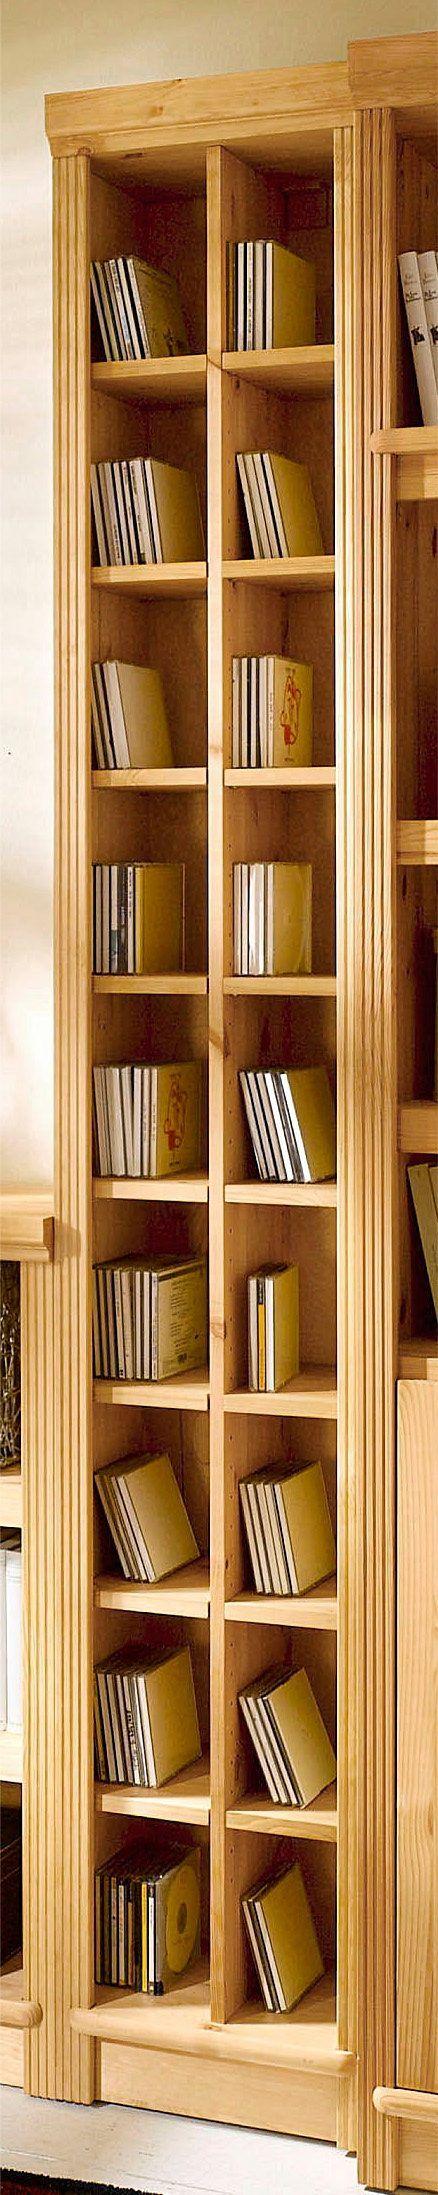 Home affaire CD-Regal »Soeren« braun, für Tiefe 29 cm, Höhe 185cm, FSC®-zertifiziert Jetzt bestellen unter: https://moebel.ladendirekt.de/wohnzimmer/tv-hifi-moebel/cd-dvd-regale/?uid=e8a1afba-7847-5b7a-b44b-3af45b936932&utm_source=pinterest&utm_medium=pin&utm_campaign=boards #cddvdregale #wohnzimmer #tvhifimoebel